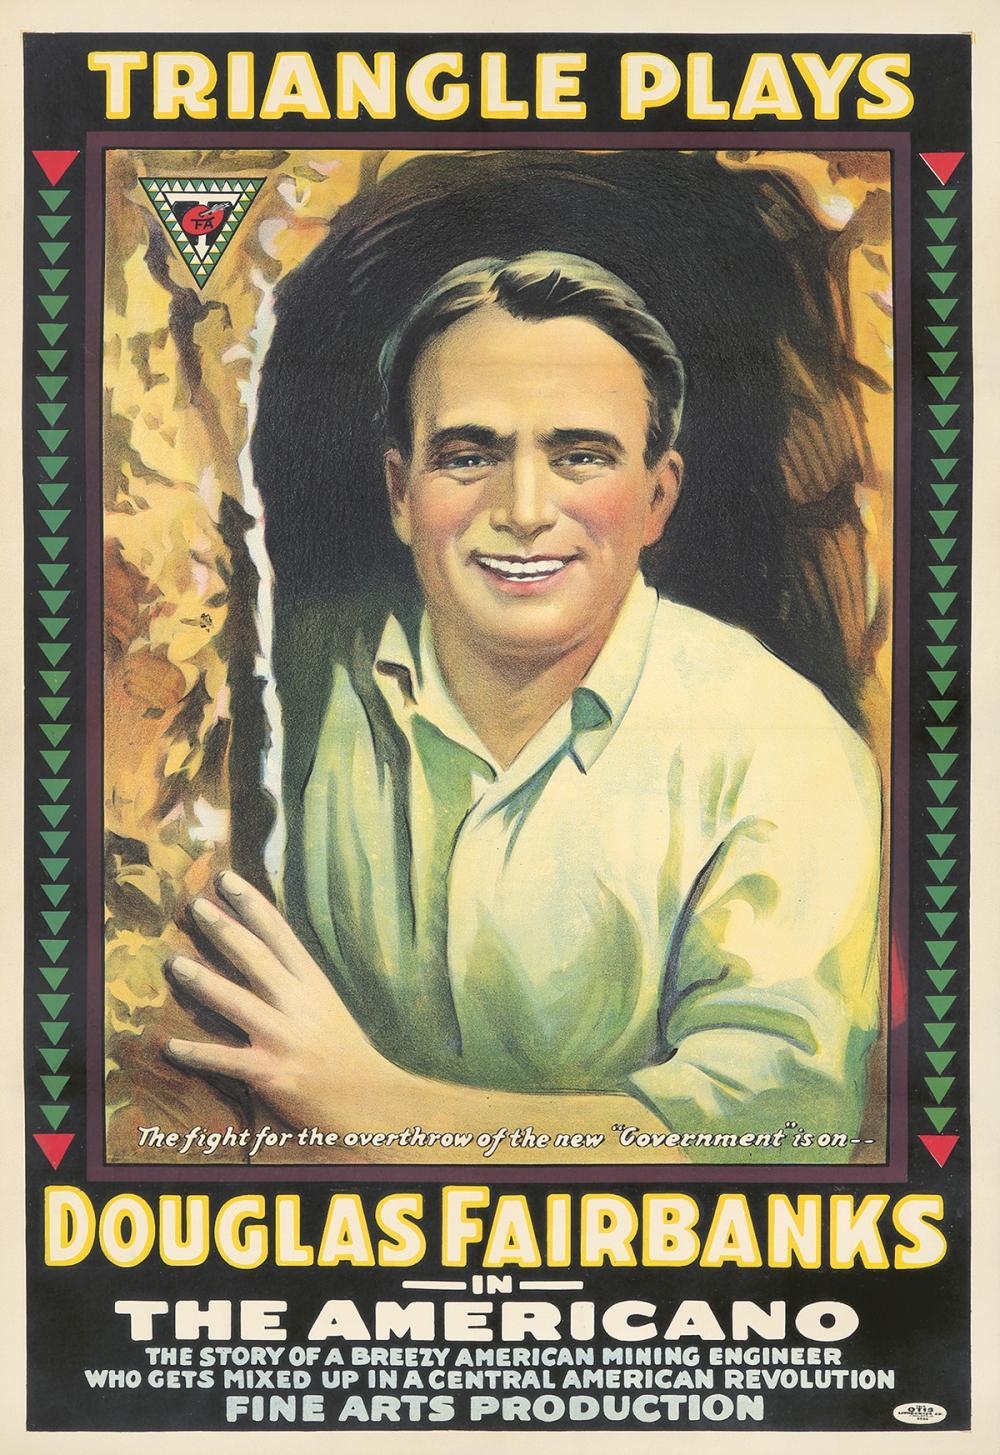 Douglas Fairbanks / The Americano. ca. 1916.